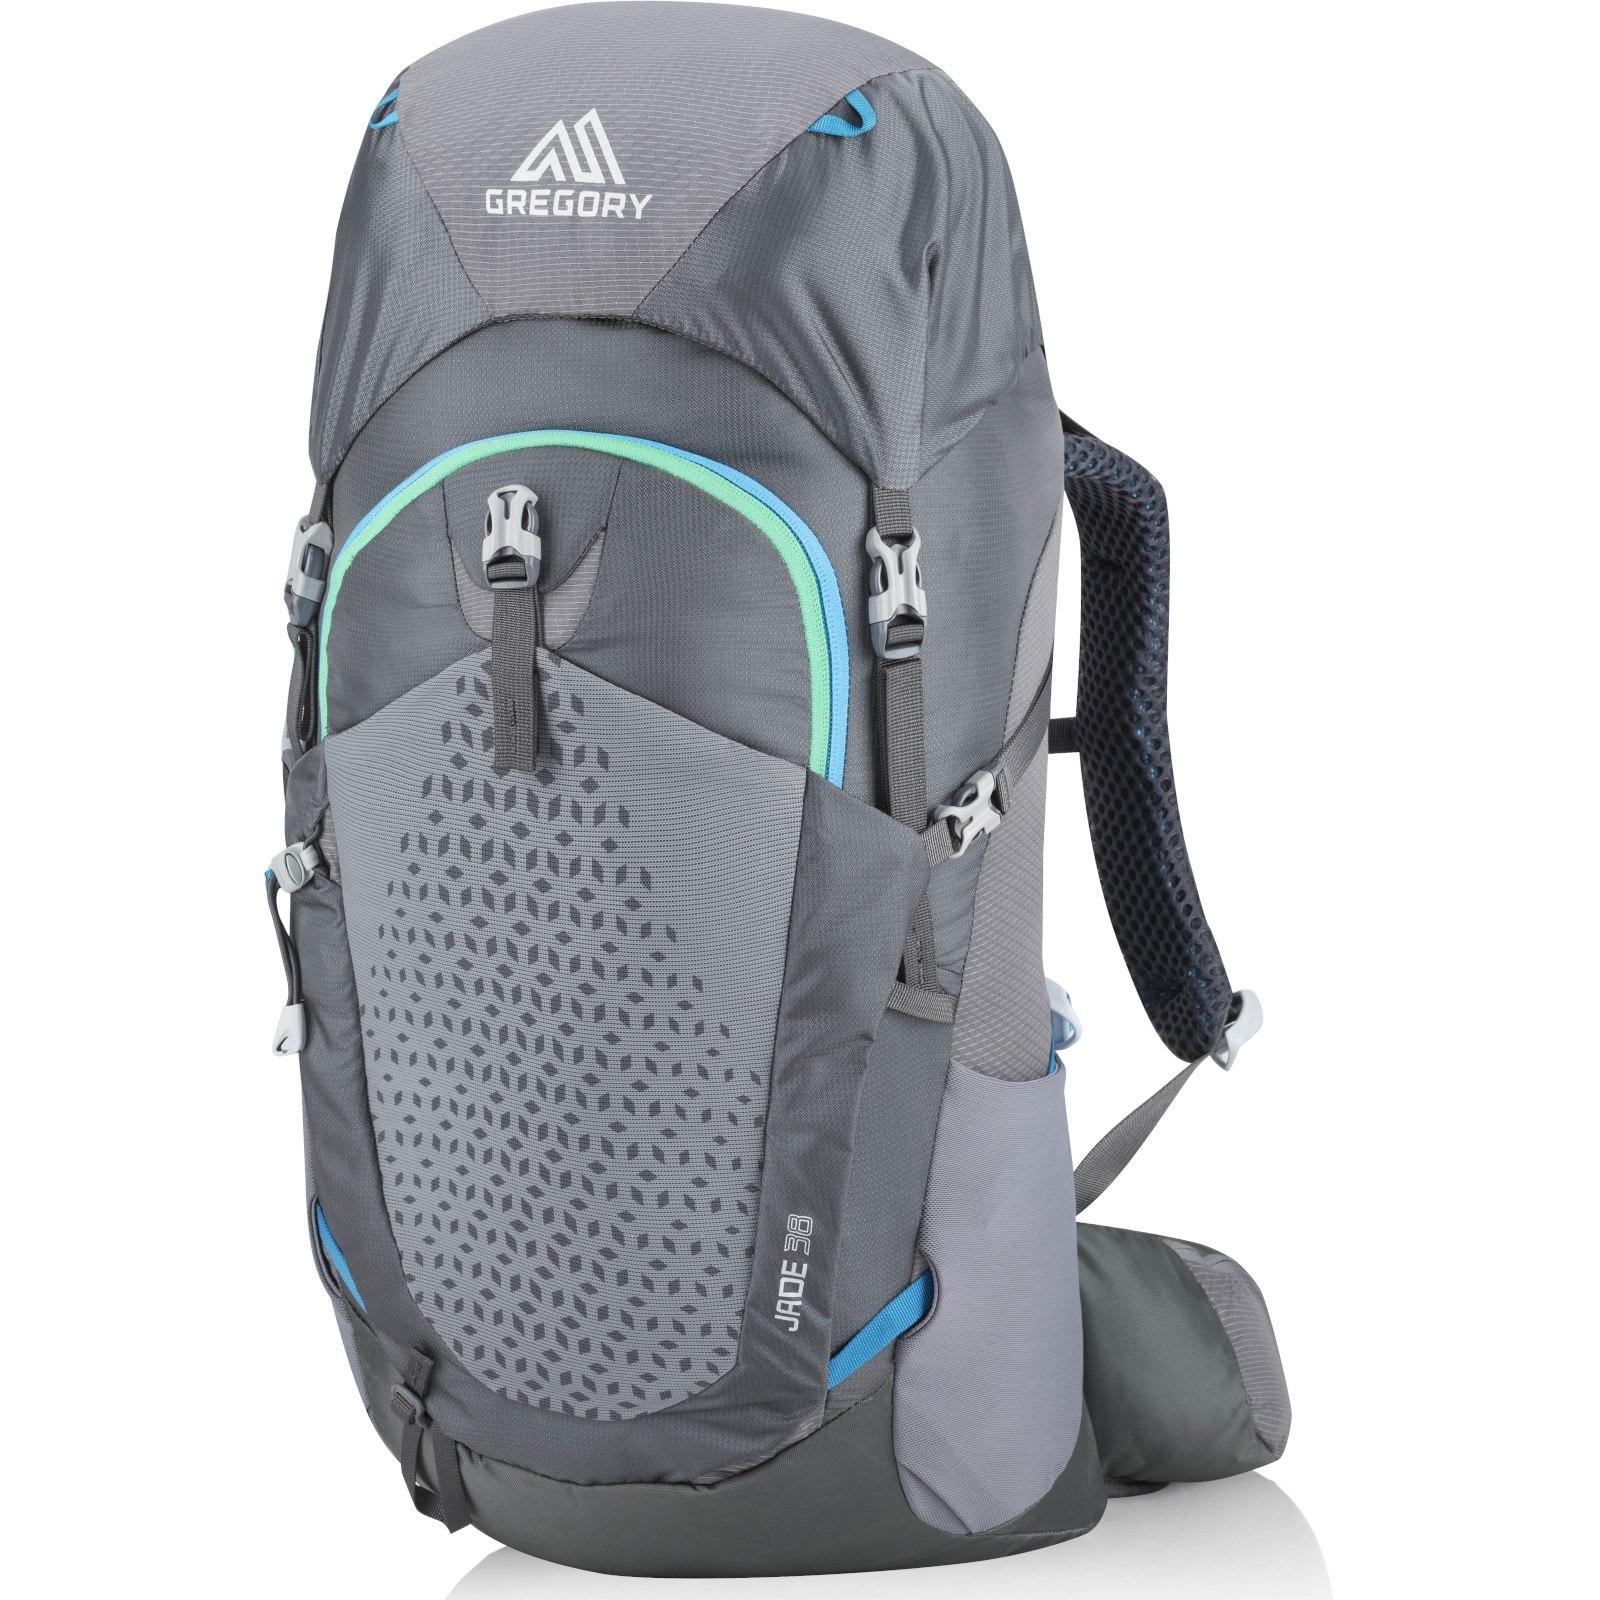 Gregory Jade 38 Woman's Backpack - Ethereal Grey